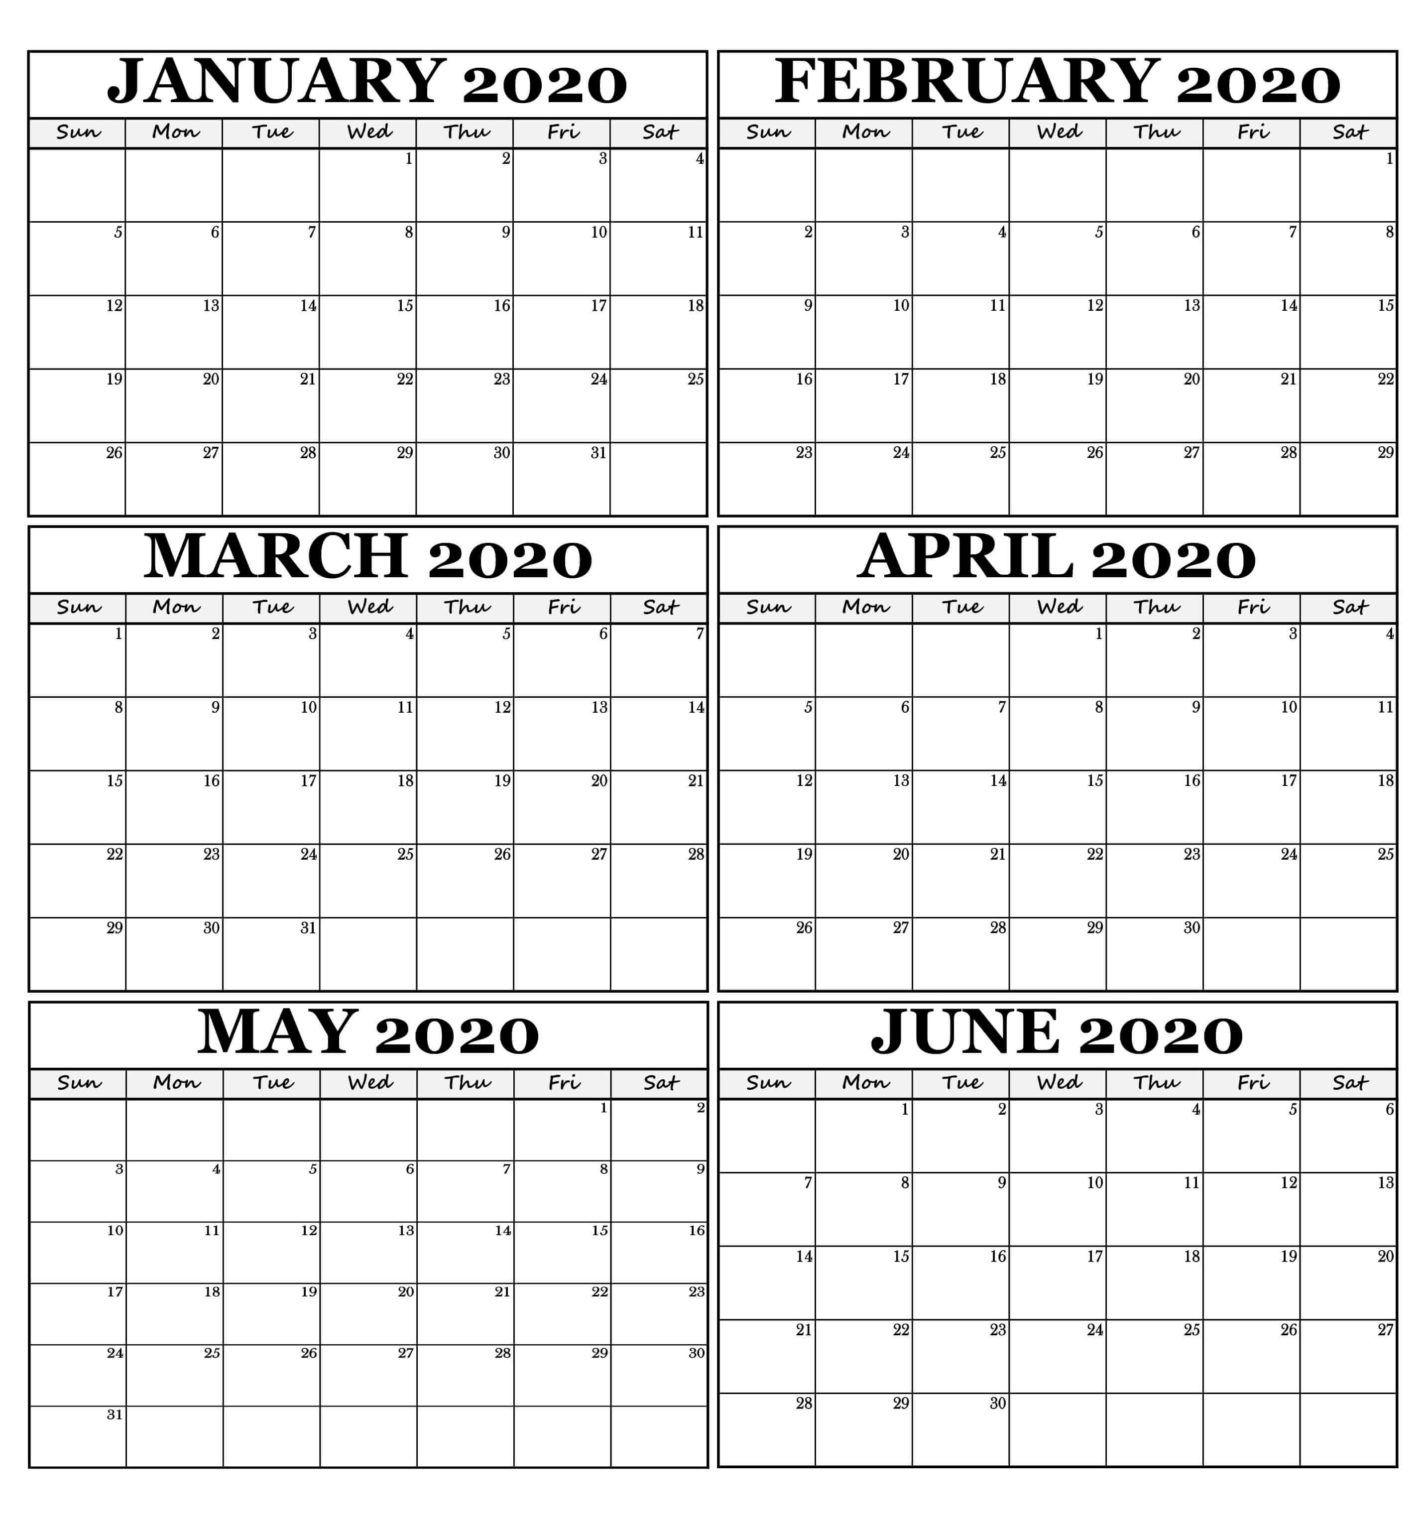 January February 2020 Calendar - Two Month Printable With January February March April May Calendar